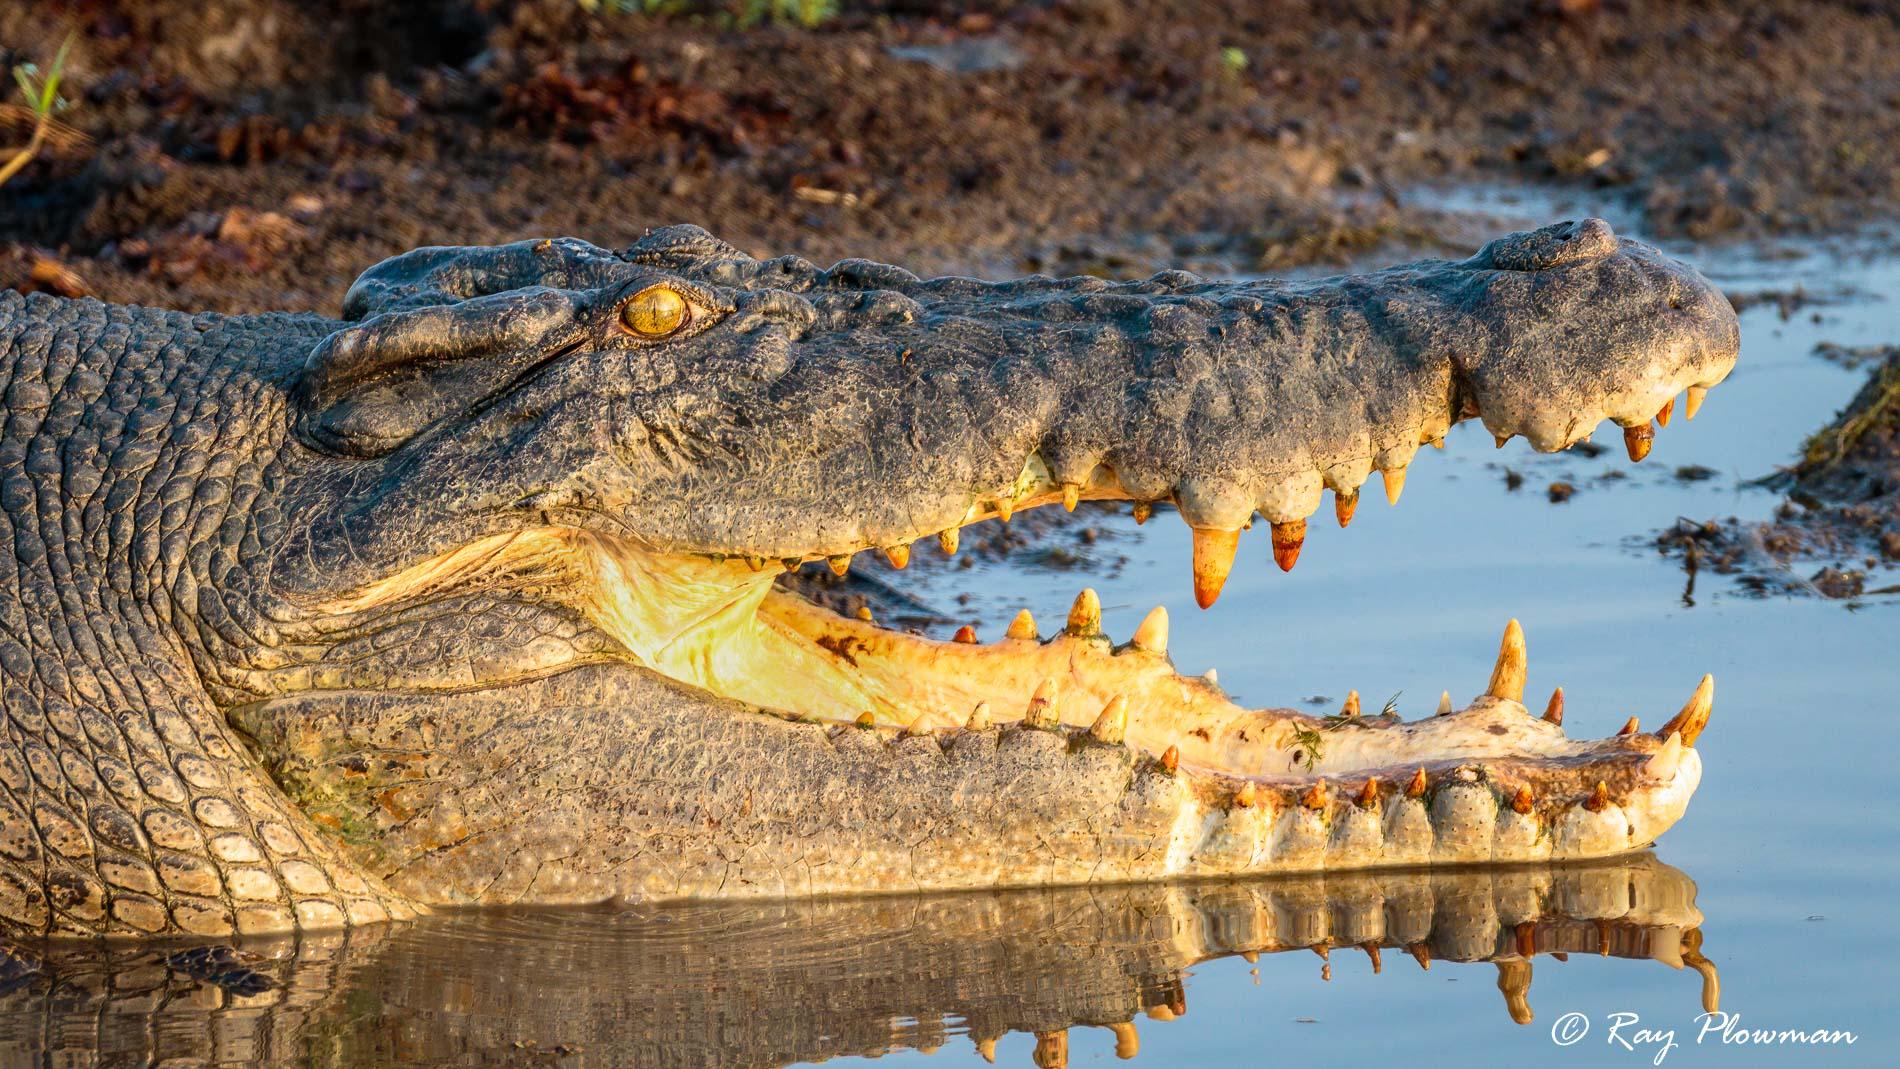 Saltwater (Estuarine) Crocodile (Crocodylus porosus) at Yellow Water Region of the Kakadu National Park in Northern Territories